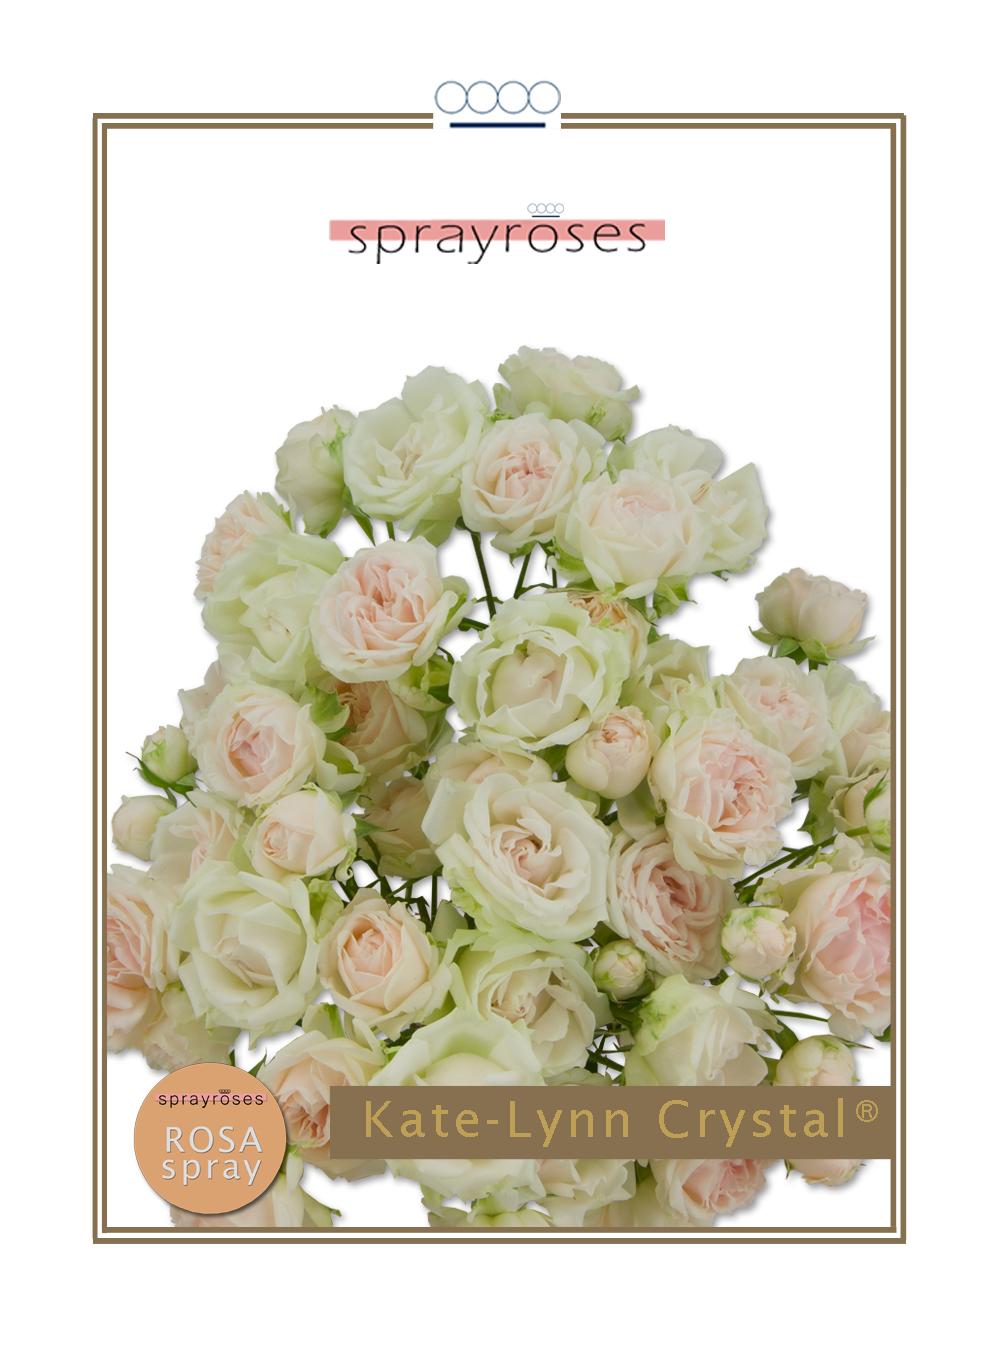 Kate-Lynn Crystal®